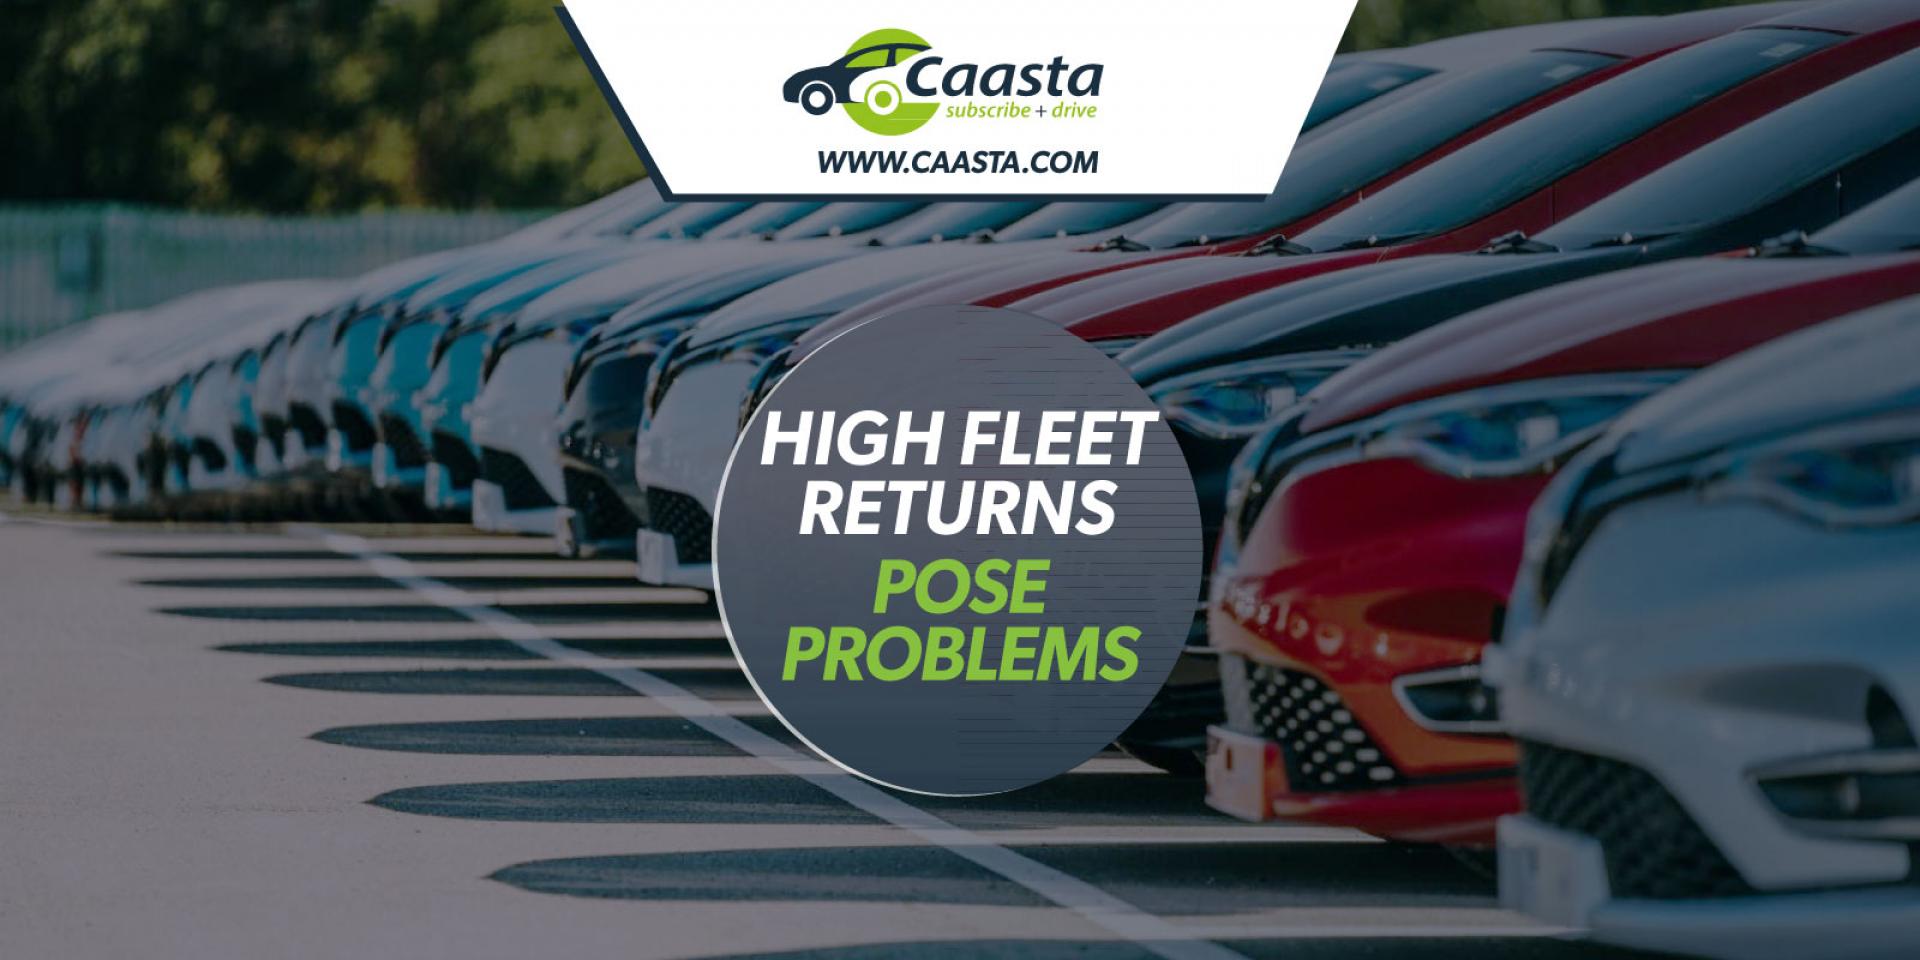 High fleet returns pose problems for businesses